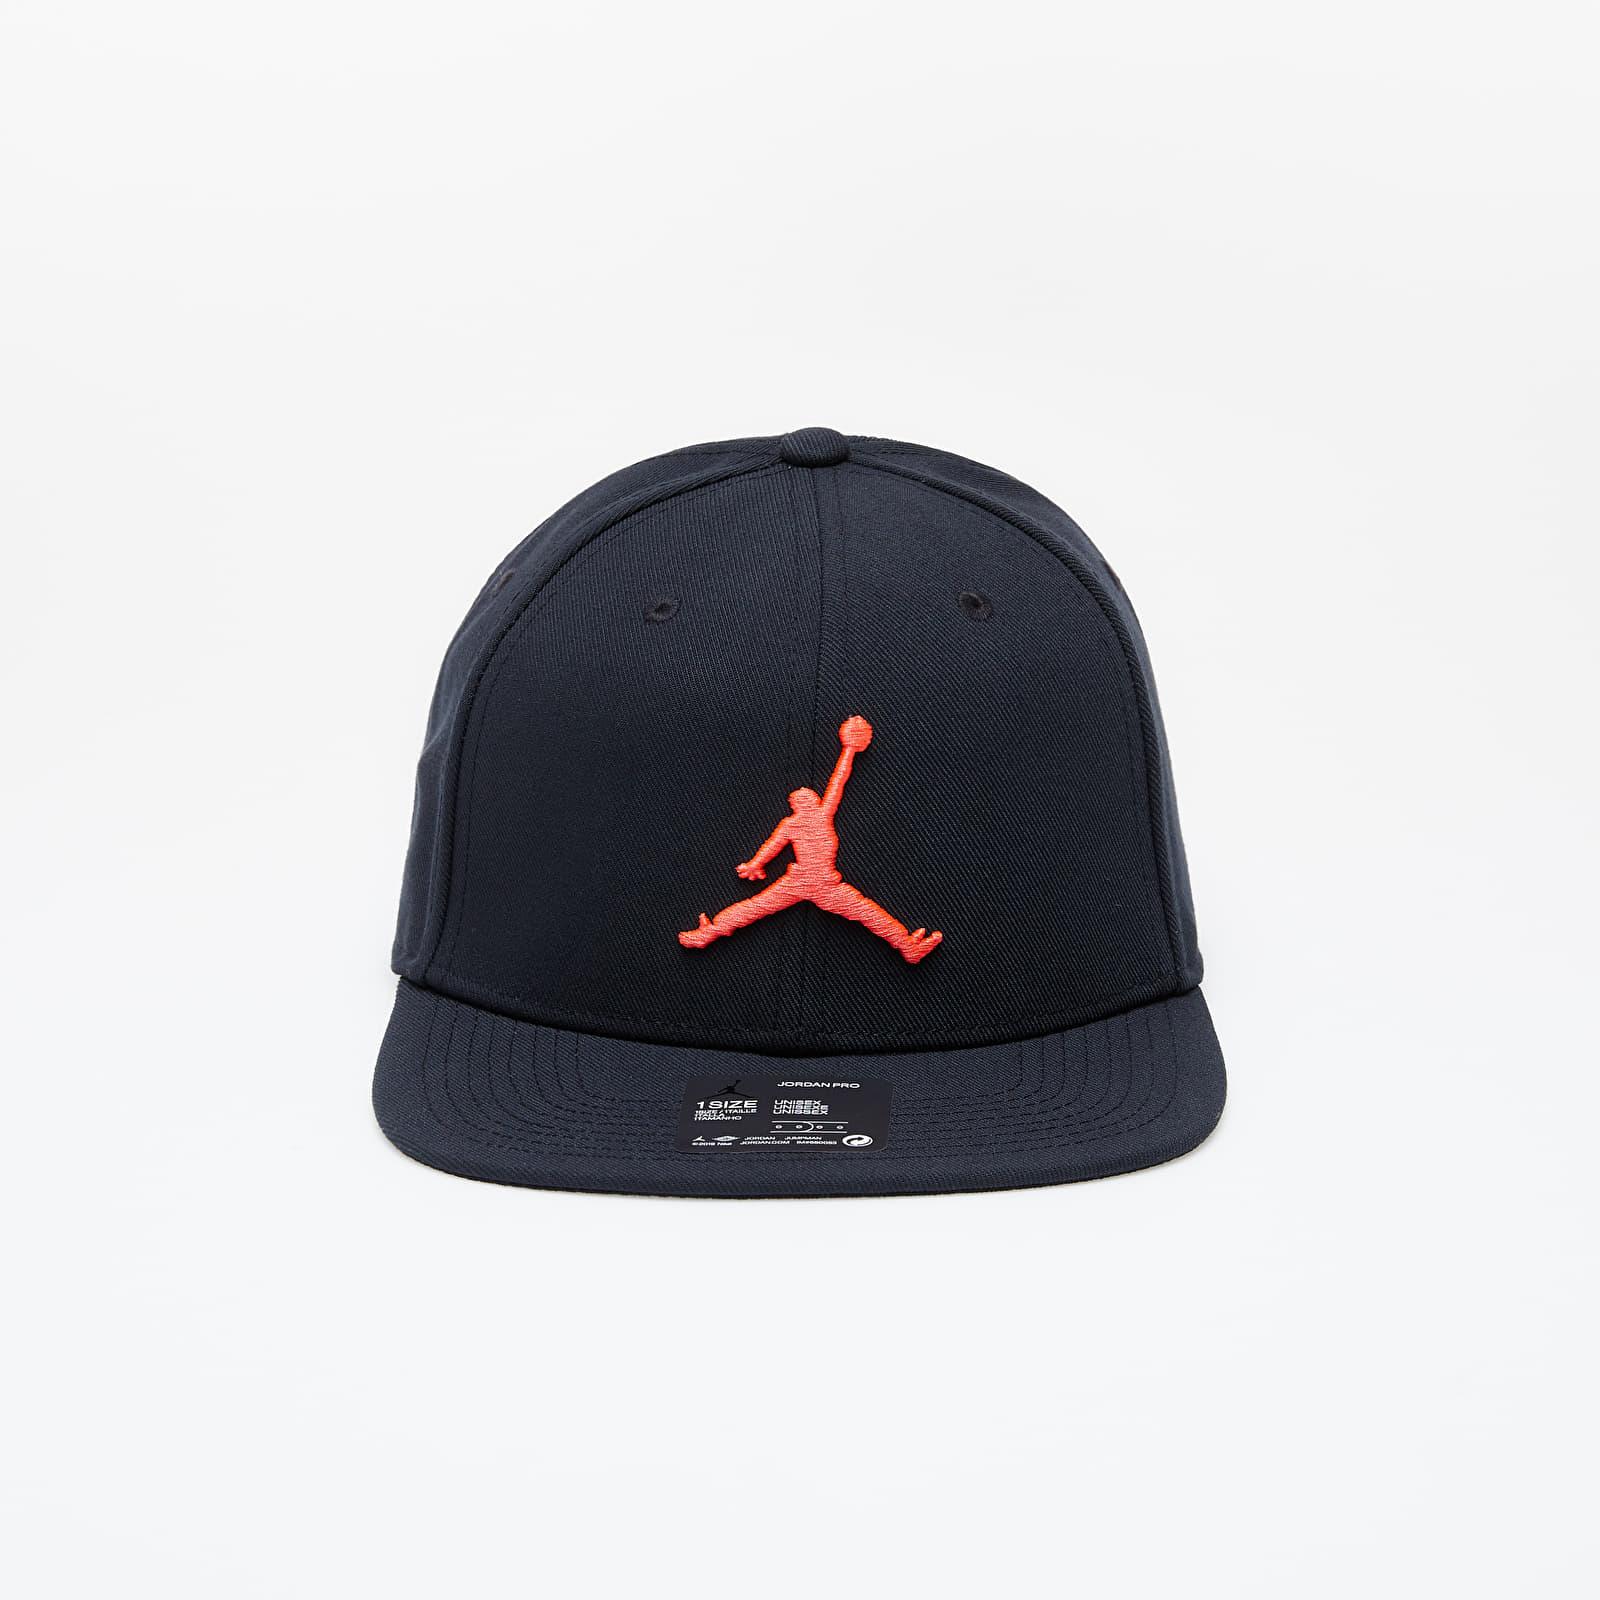 Caps Jordan Pro Jumpman Snapback Black/ Black/ Black/ Infrared 23